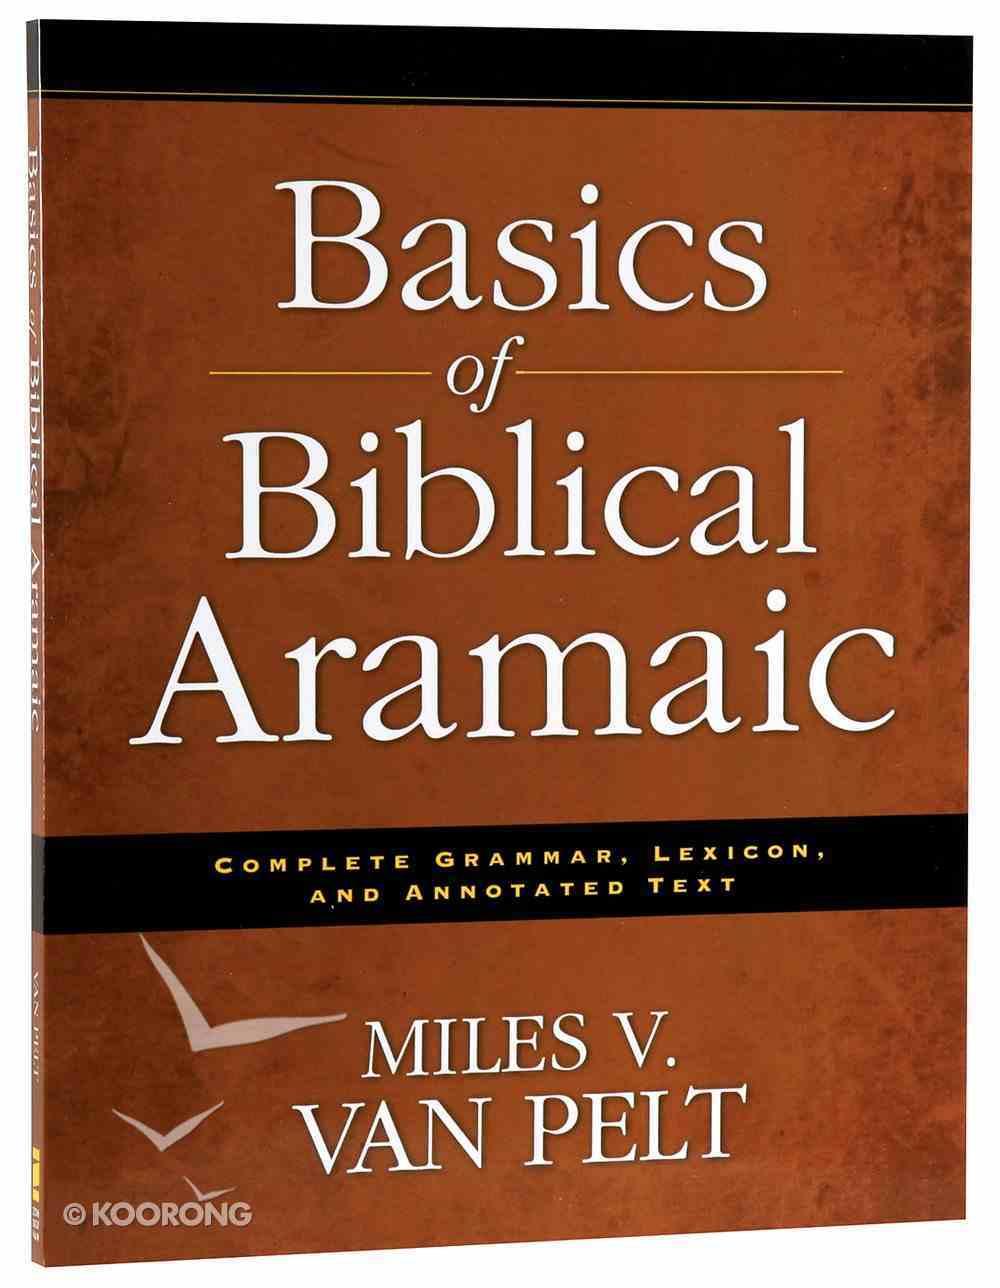 Basics of Biblical Aramaic Paperback